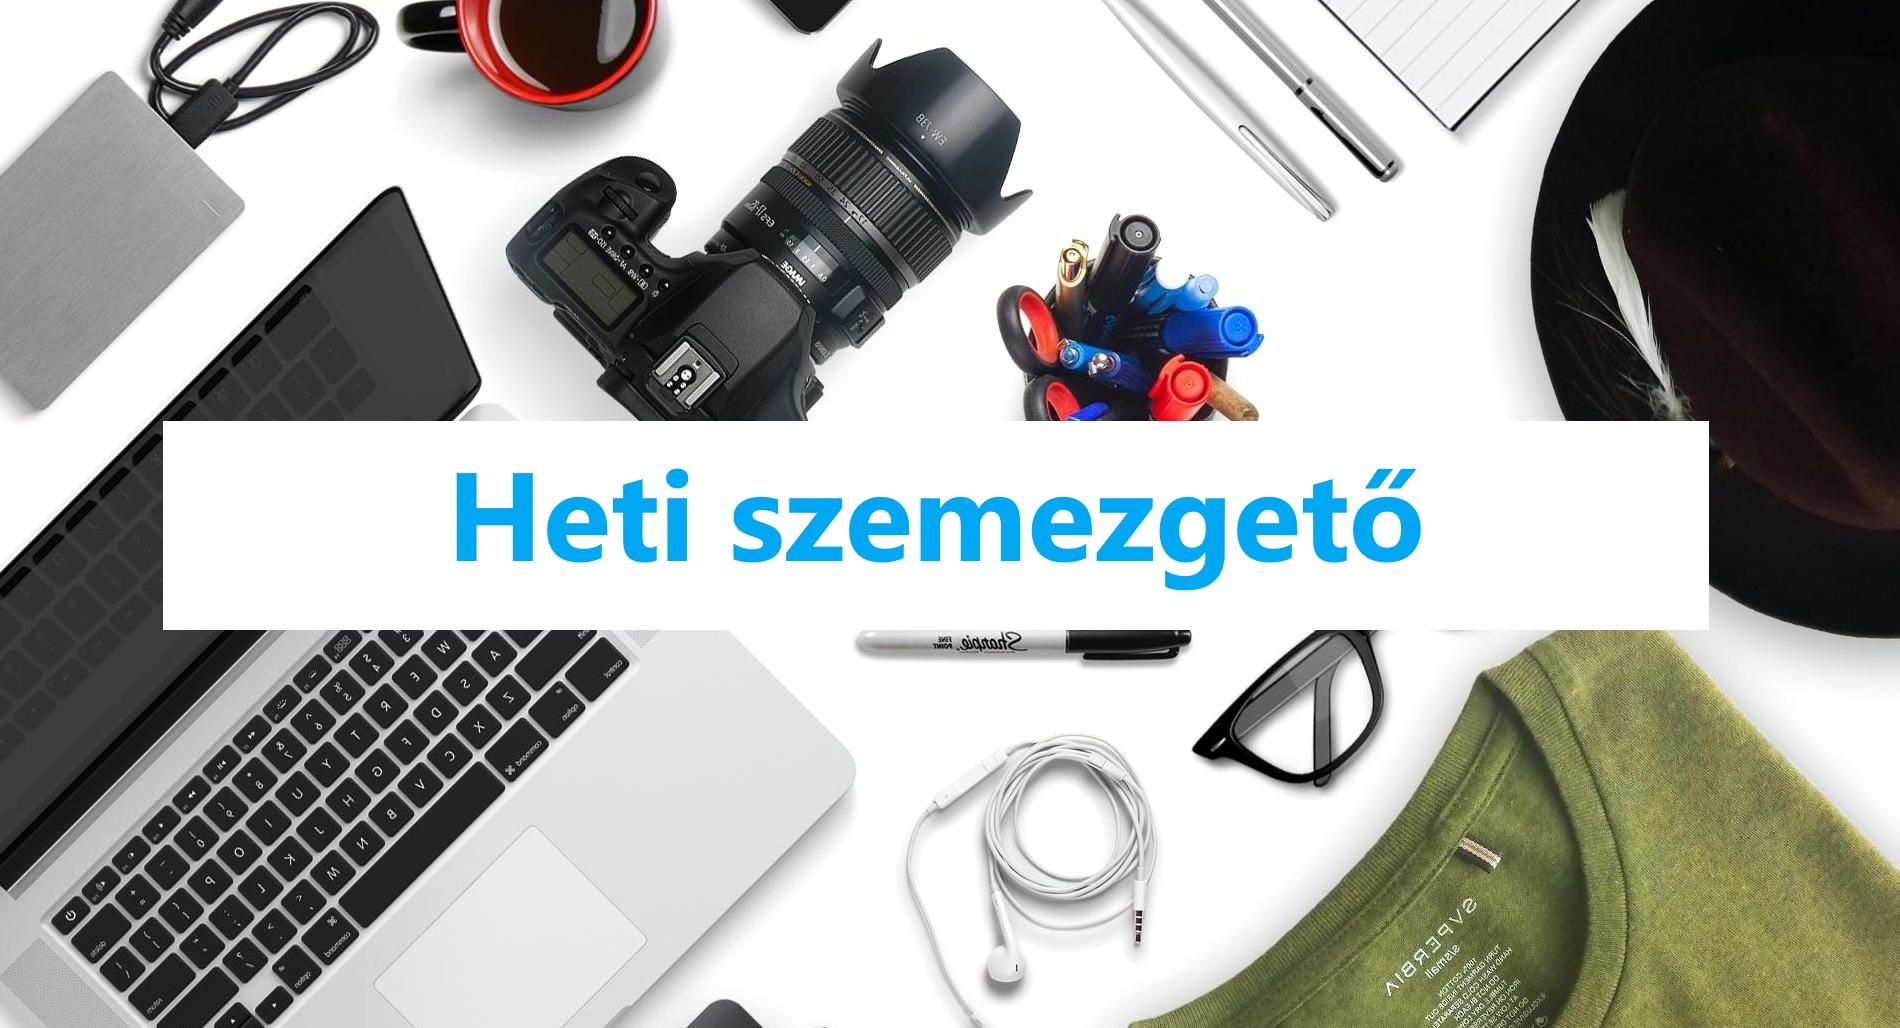 heti_szemezgeto_uj_125.jpg